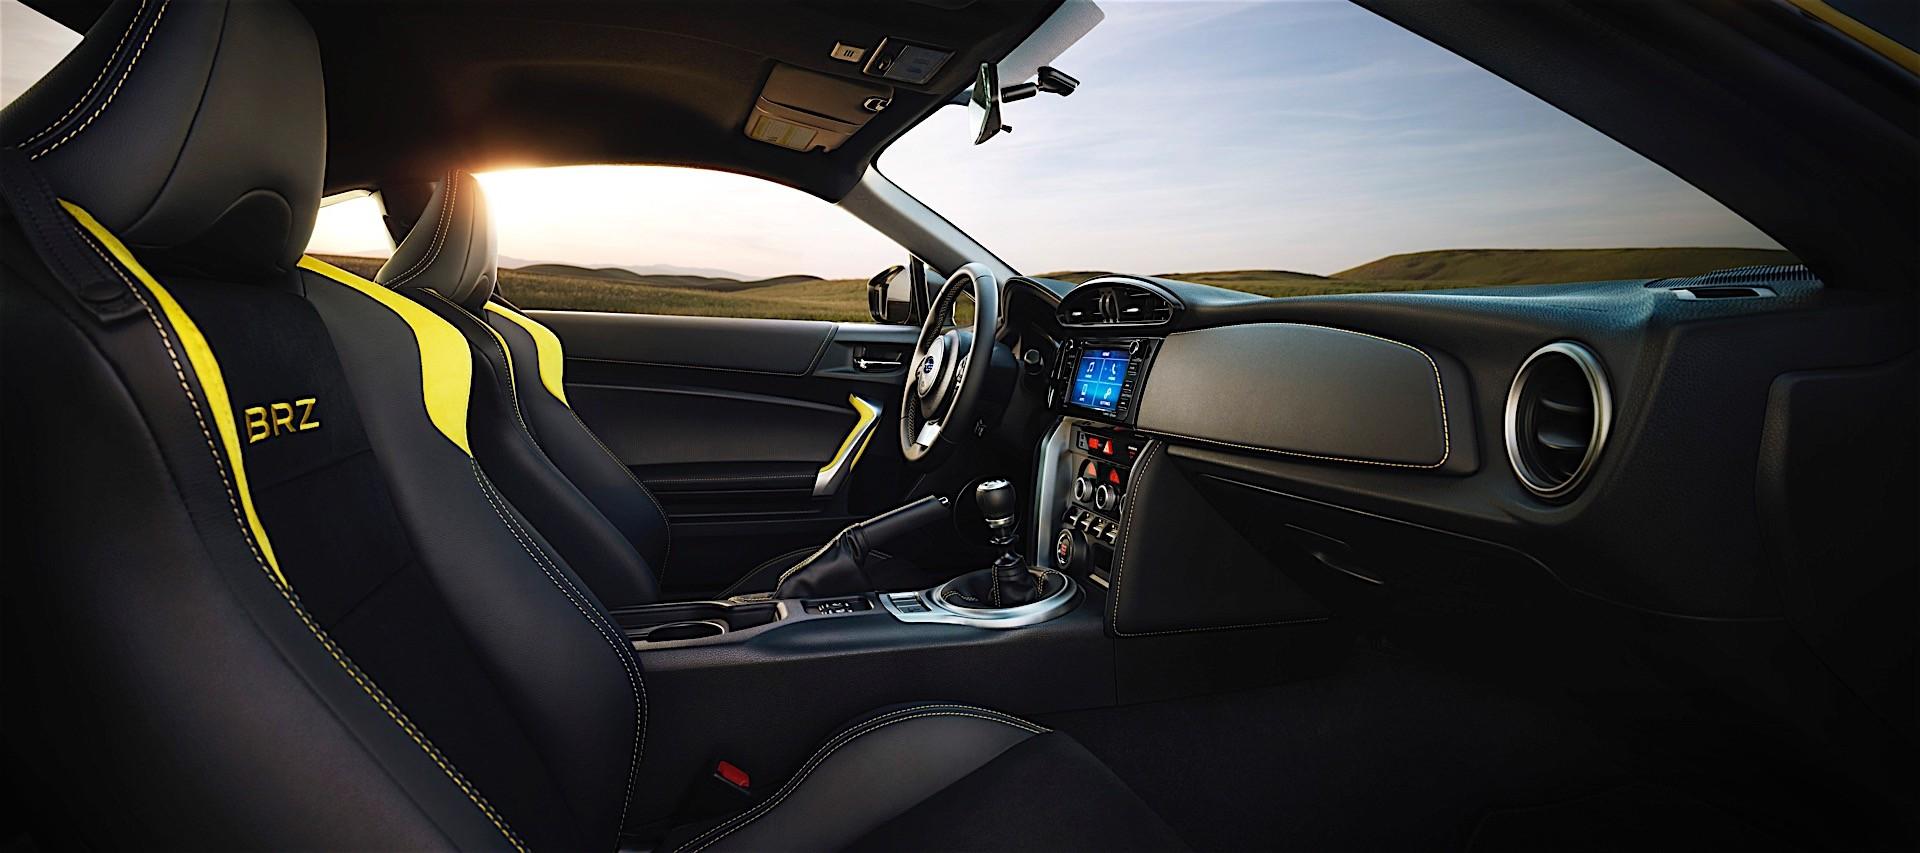 2017 Subaru Brz Yellow Special Edition